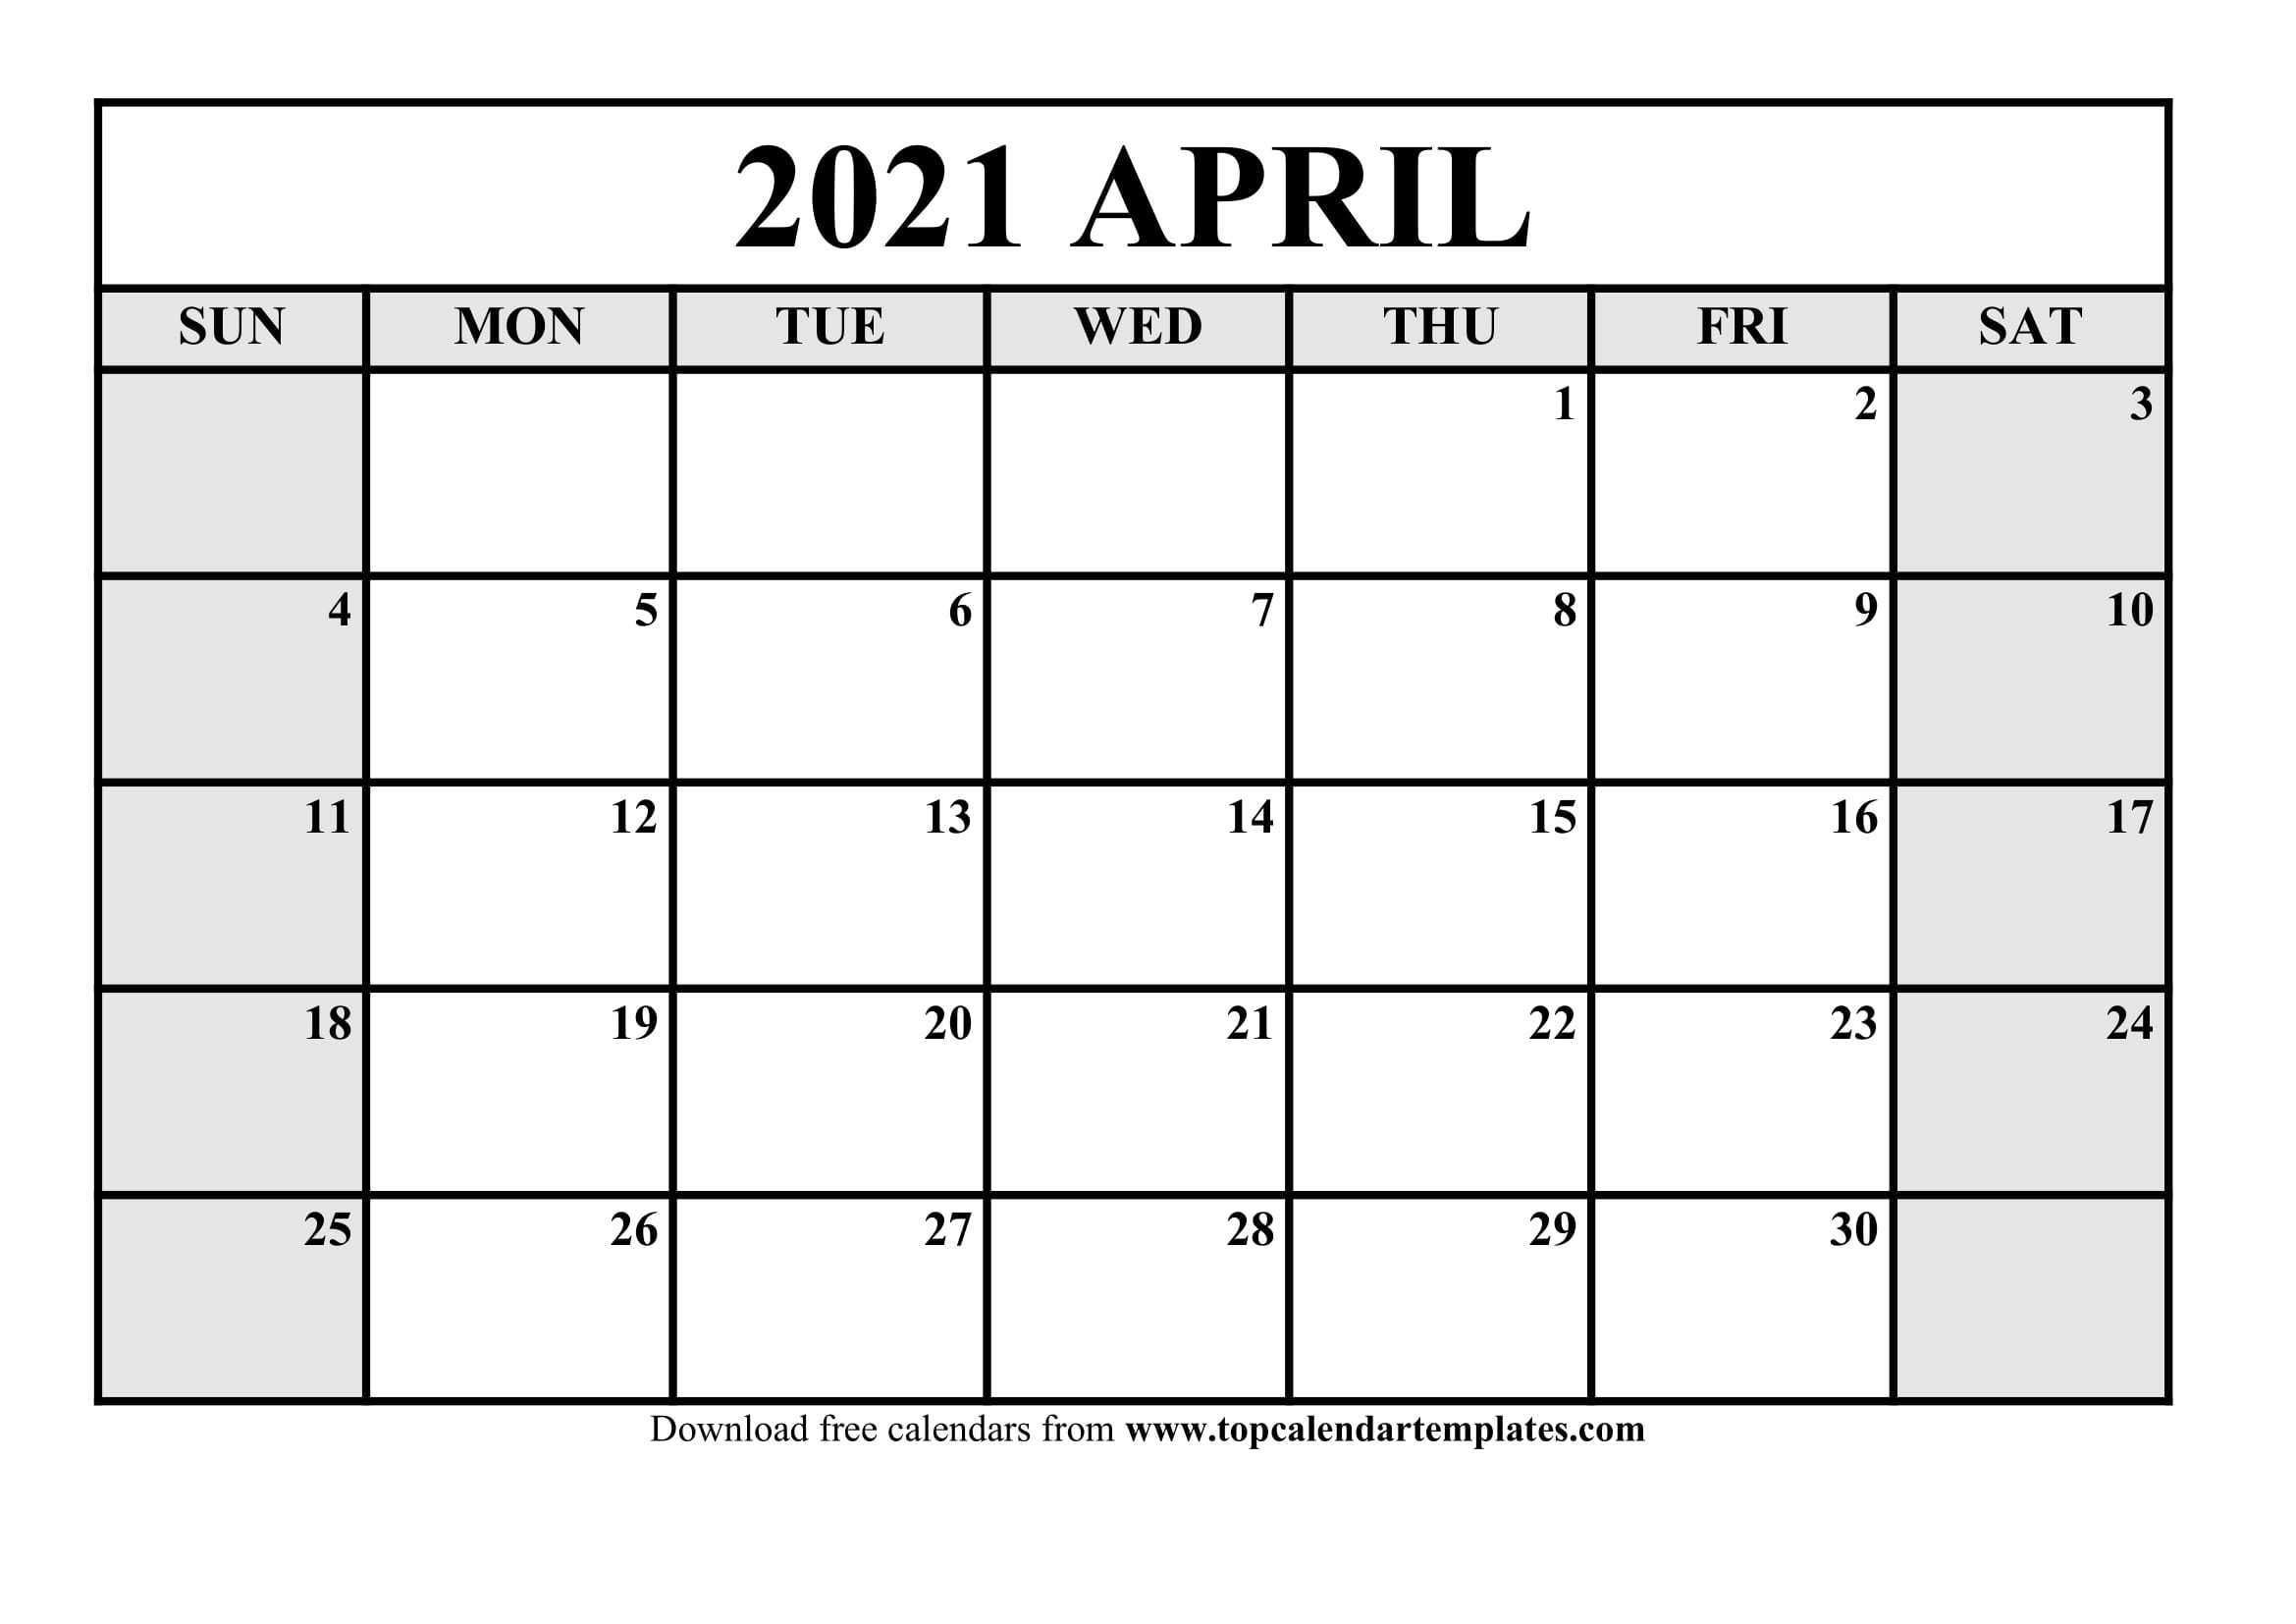 Pick Downloadable Calendar Print Out 2021